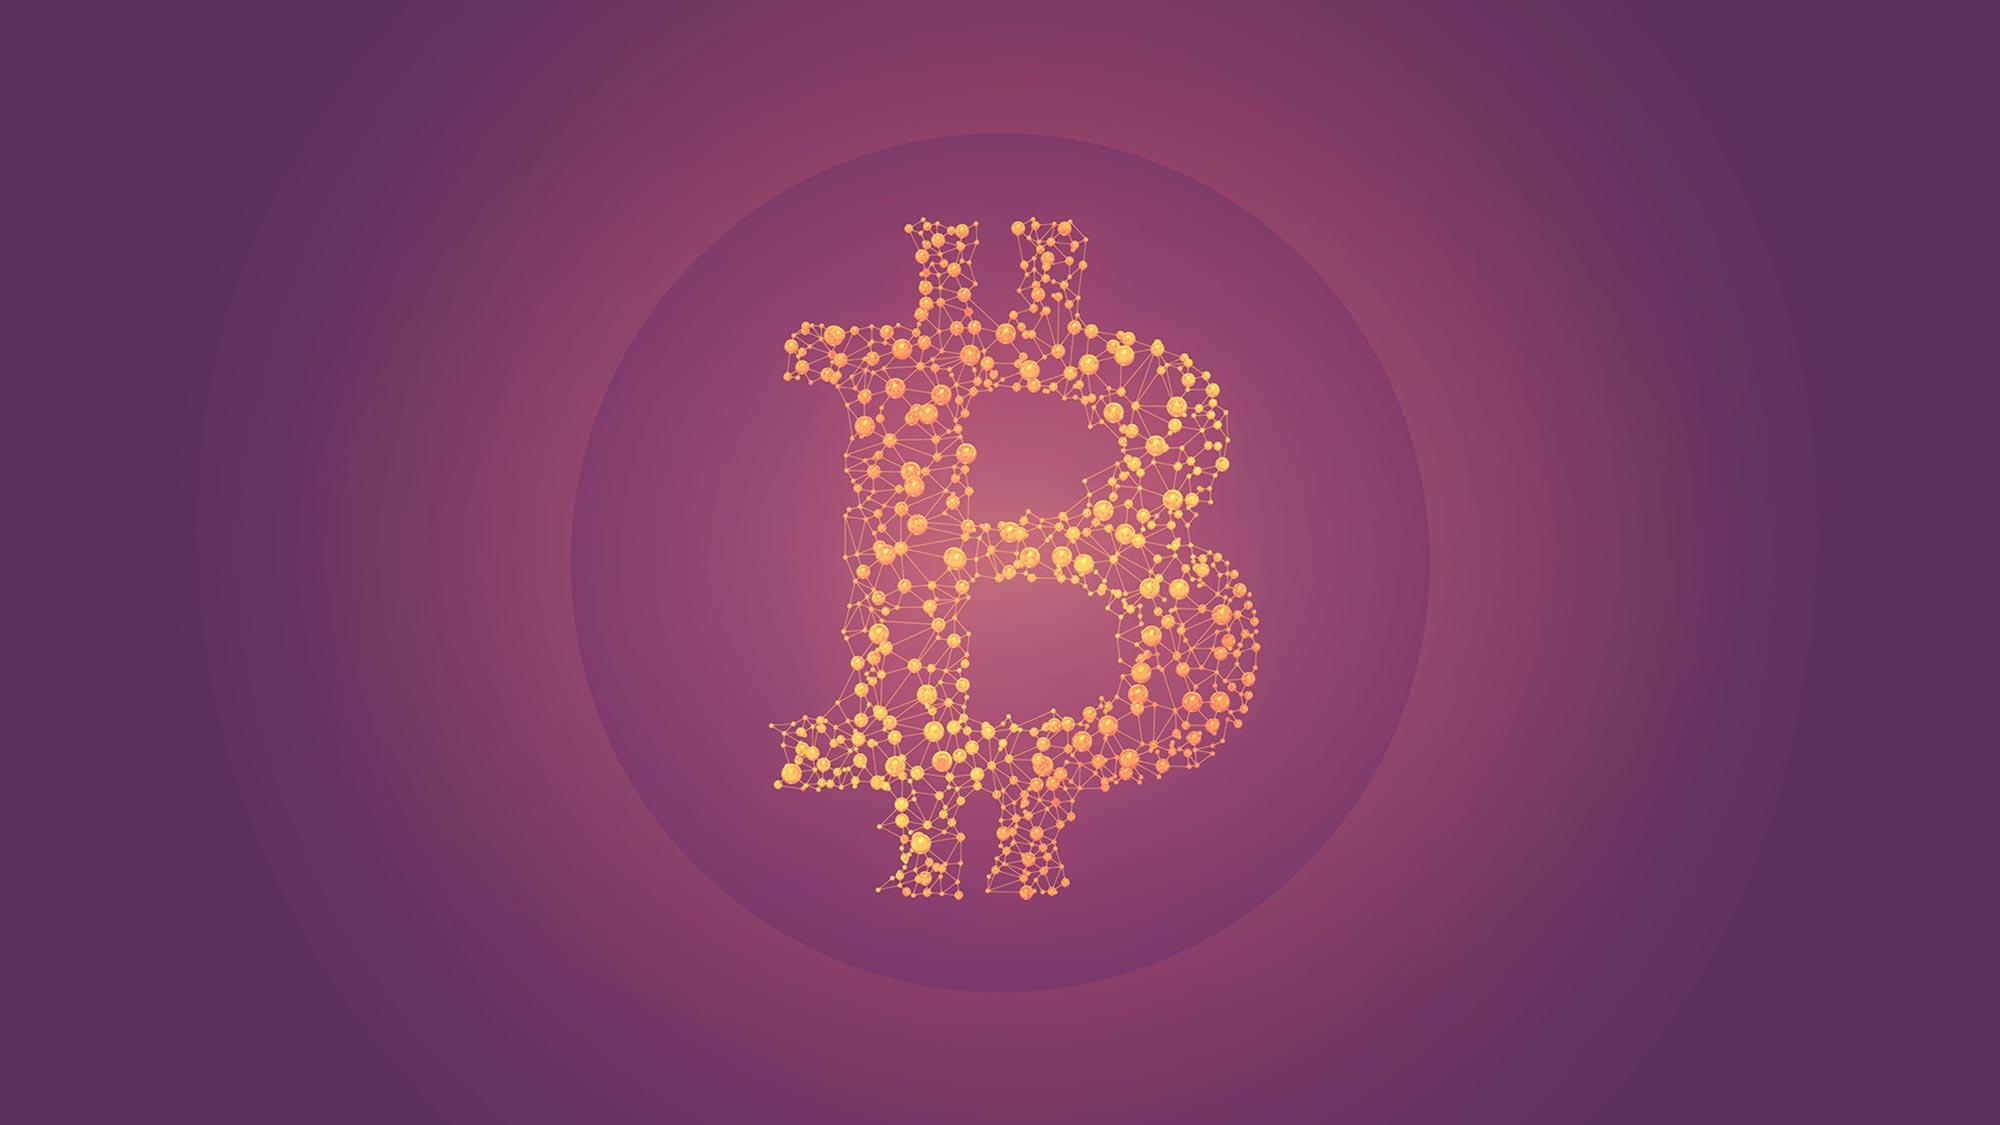 Bitcoin_Network_Purple_1920x1080